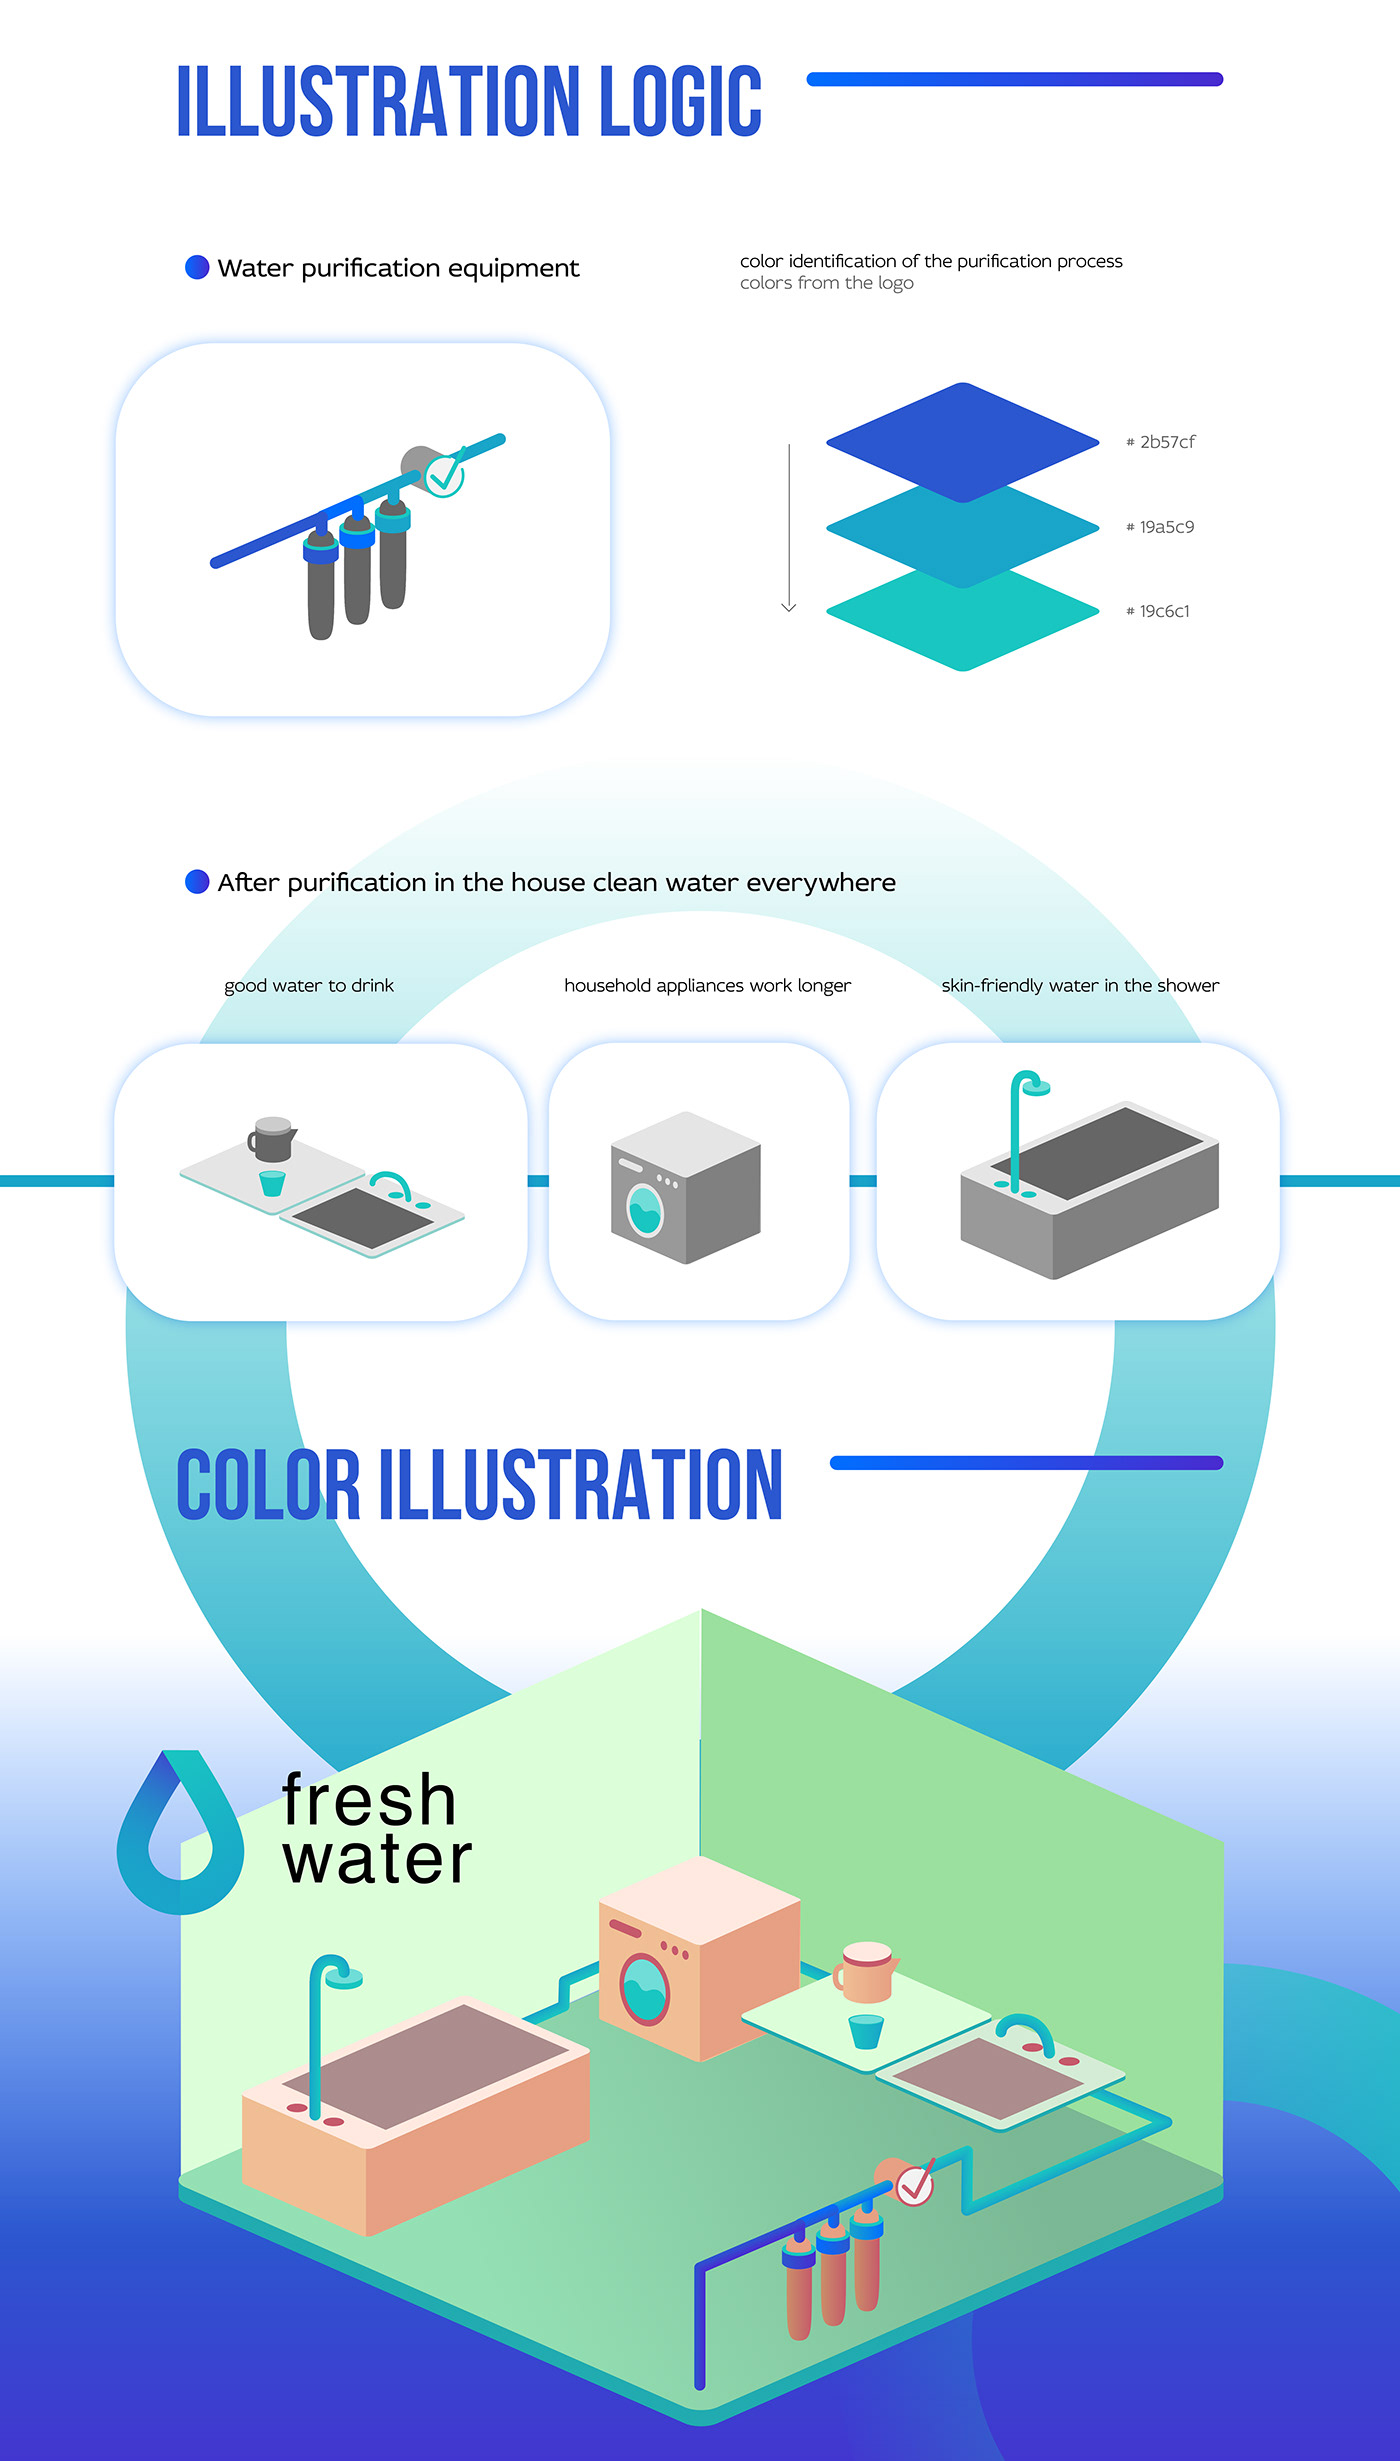 water purification ILLUSTRATION  isometrica isometric illustration иллюстрация изомерика изометрическая иллюстация logo fresh water